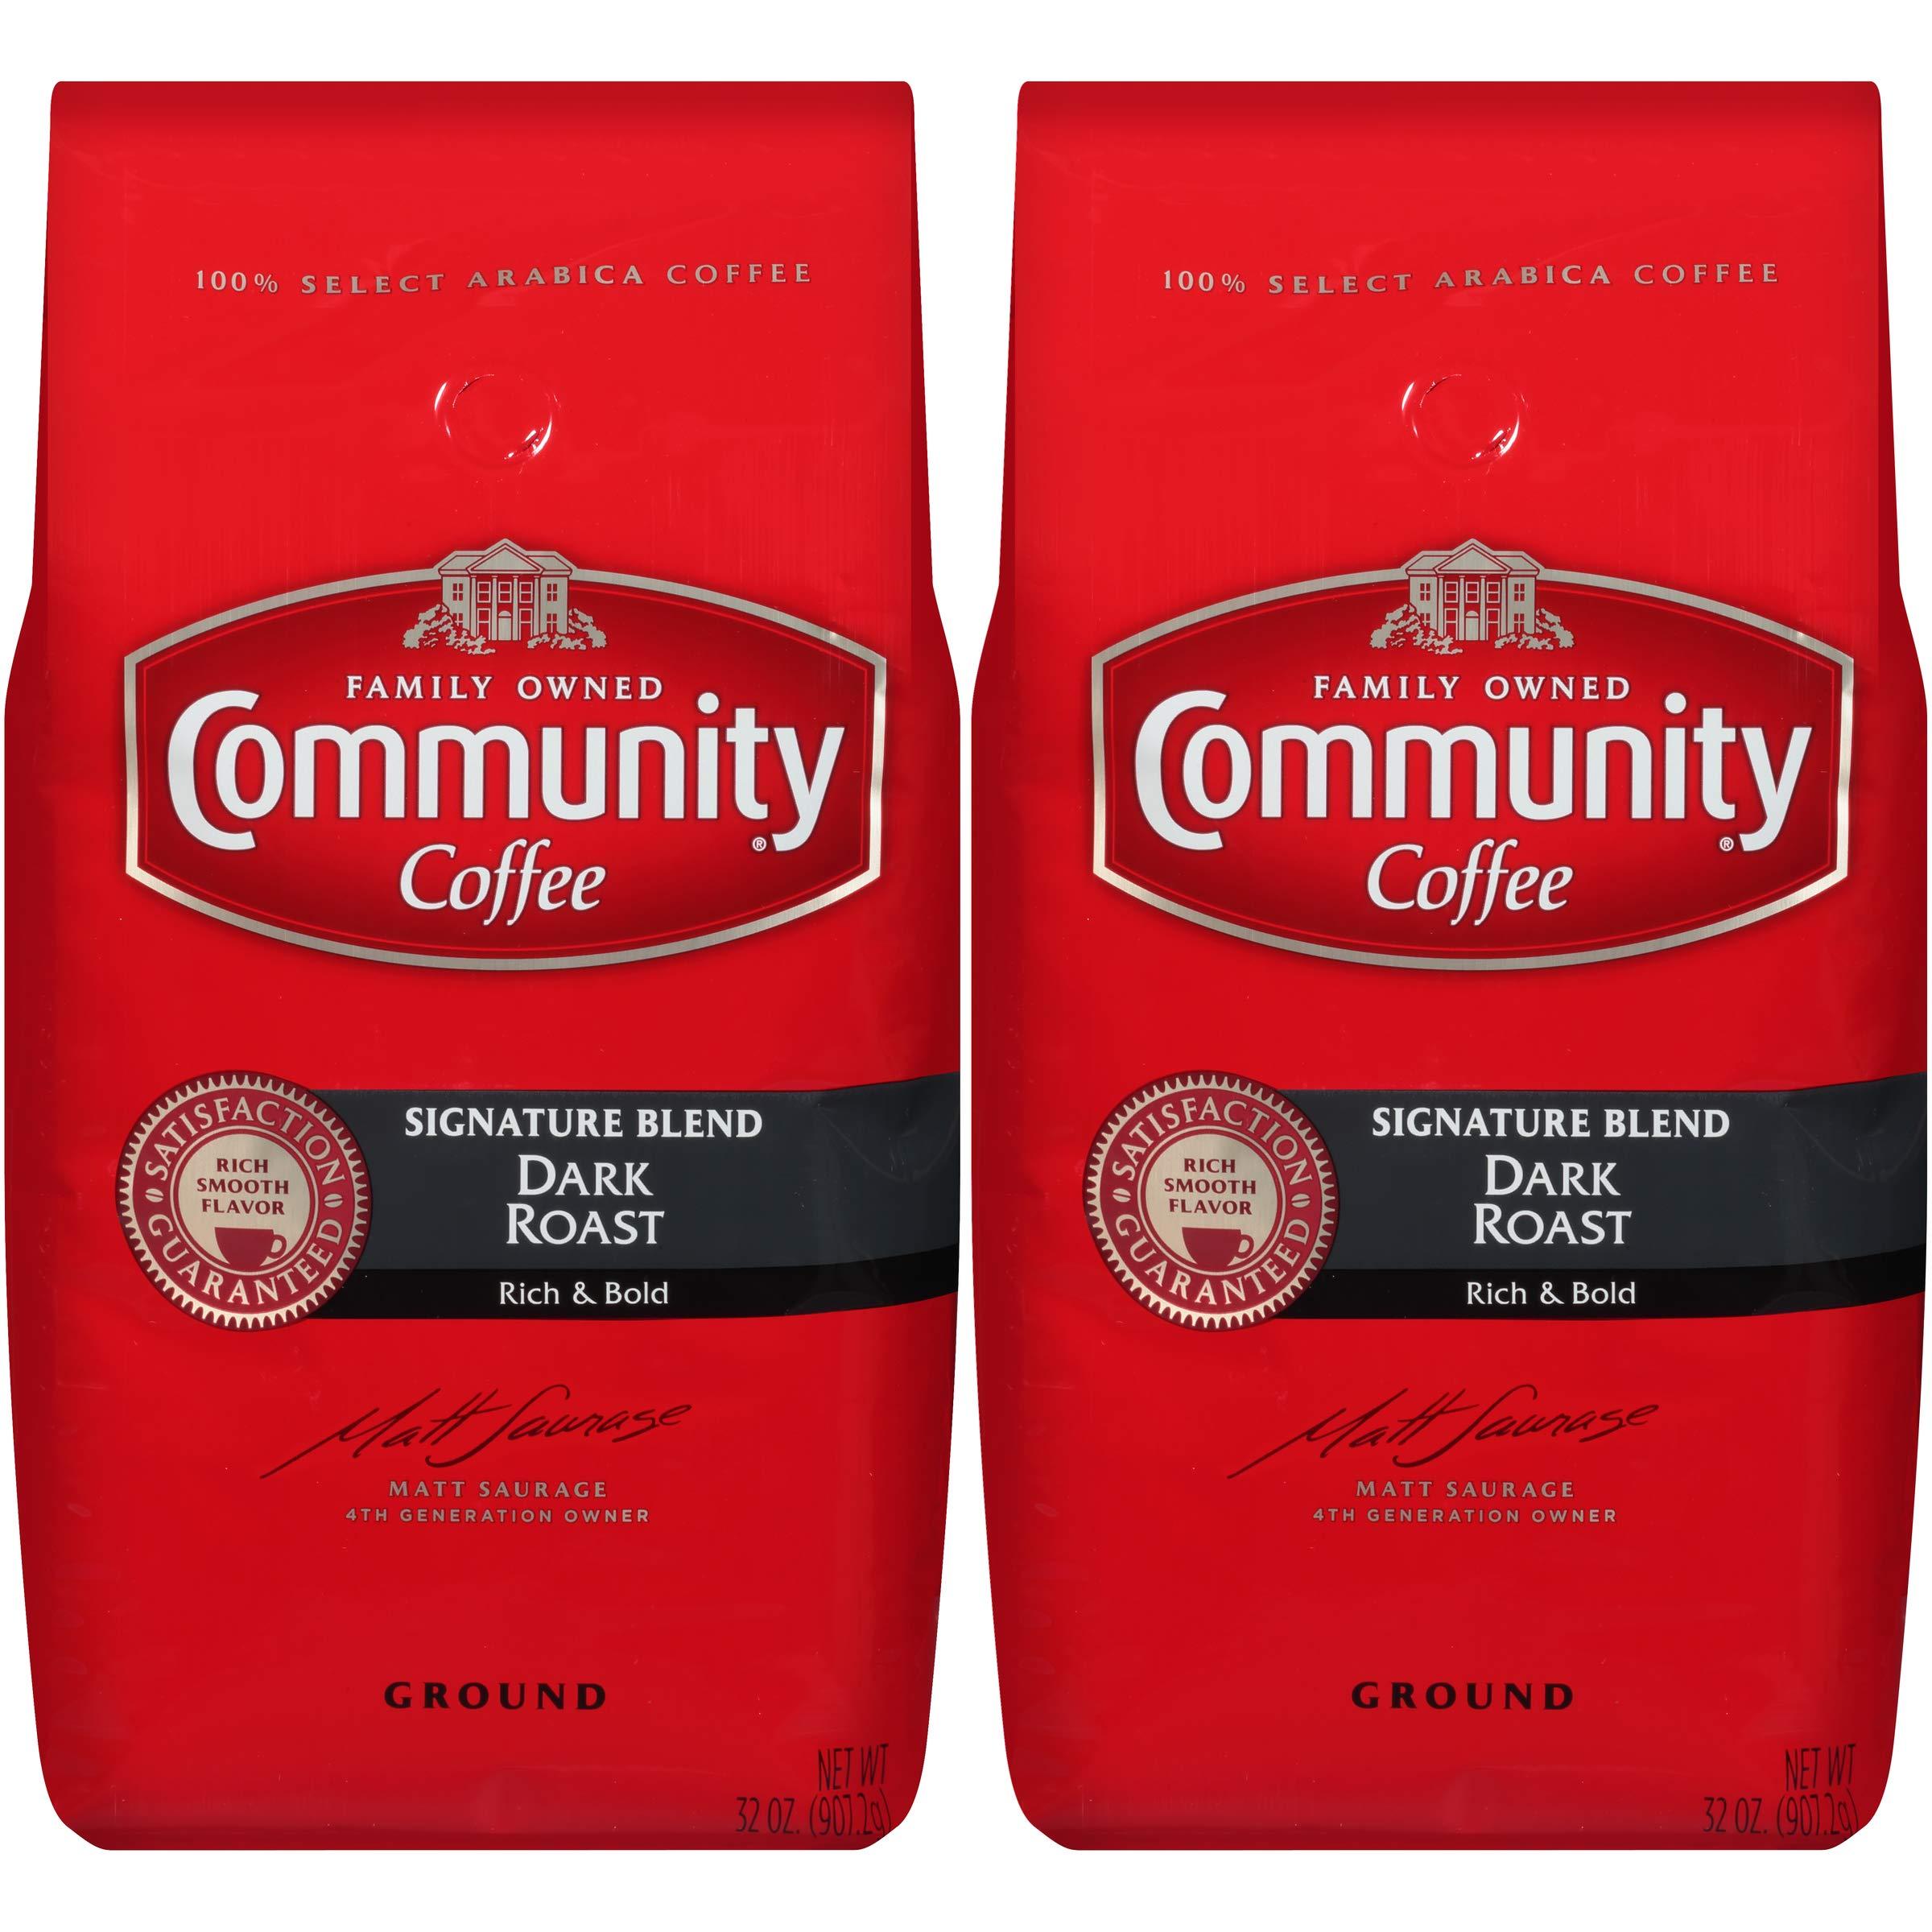 Community Coffee Signature Blend Dark Roast Premium Ground 32 Oz Bag (2 Pack), Full Body Rich Bold Taste, 100% Select Arabica Coffee Beans by Community Coffee